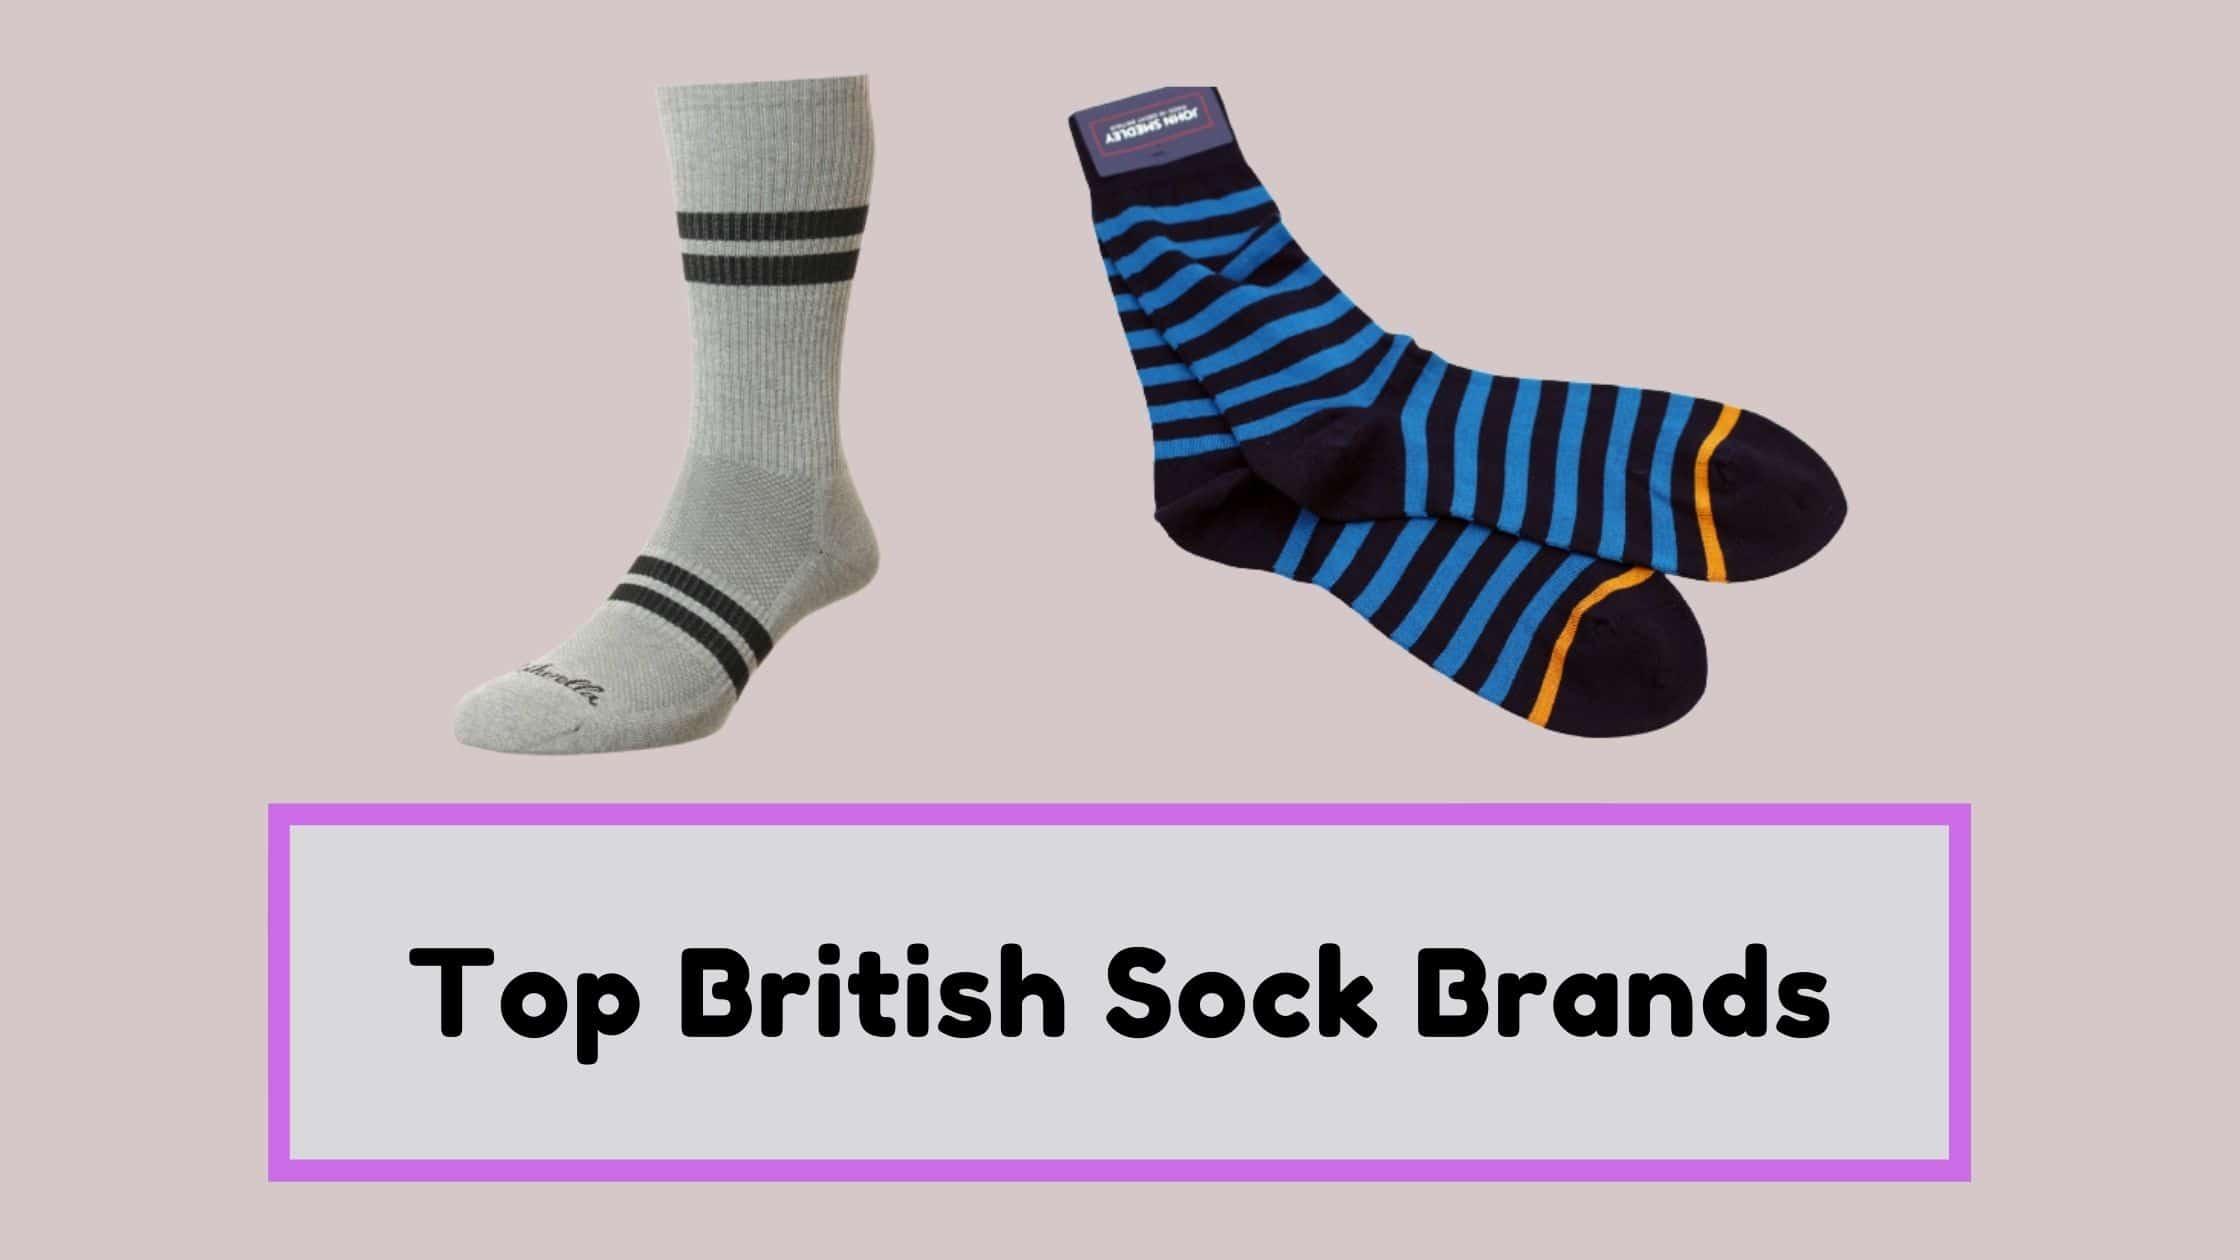 Top British Sock Brands